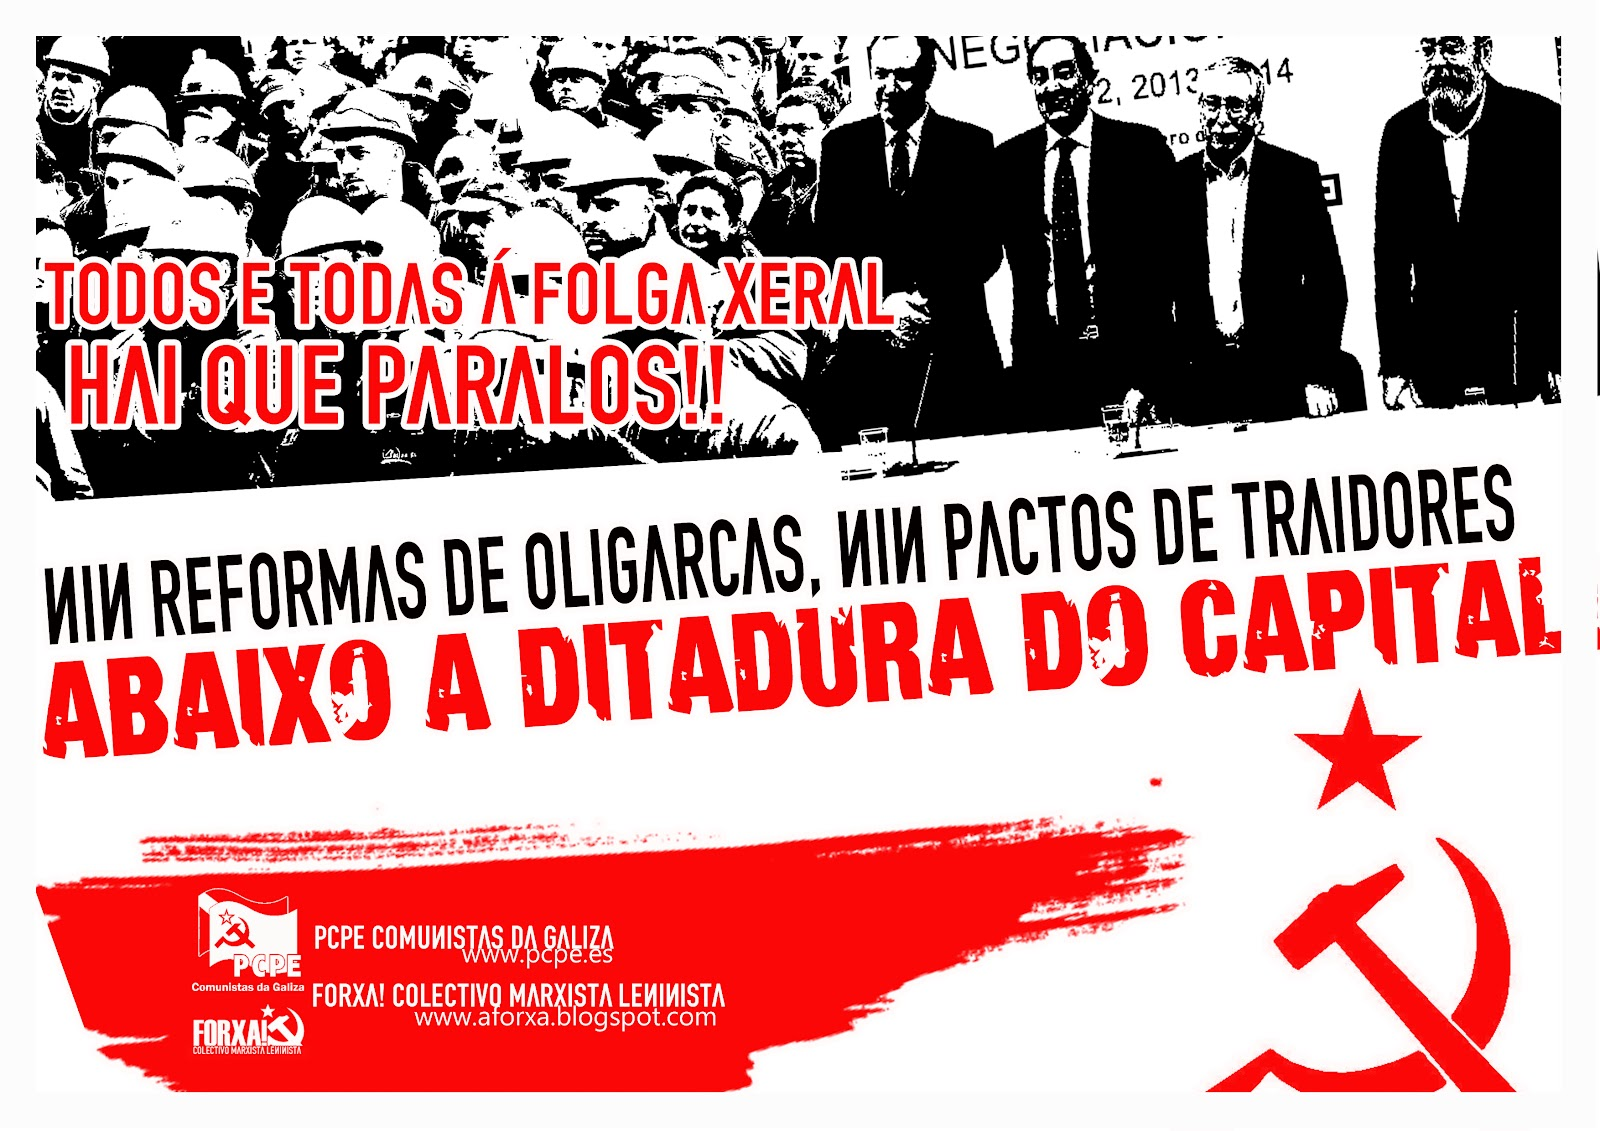 Comunicado conjunto Comunistas da Galiza (PCPE) y FORXA! Campa%C3%B1a+folgapcpe+forxaxx+correxido